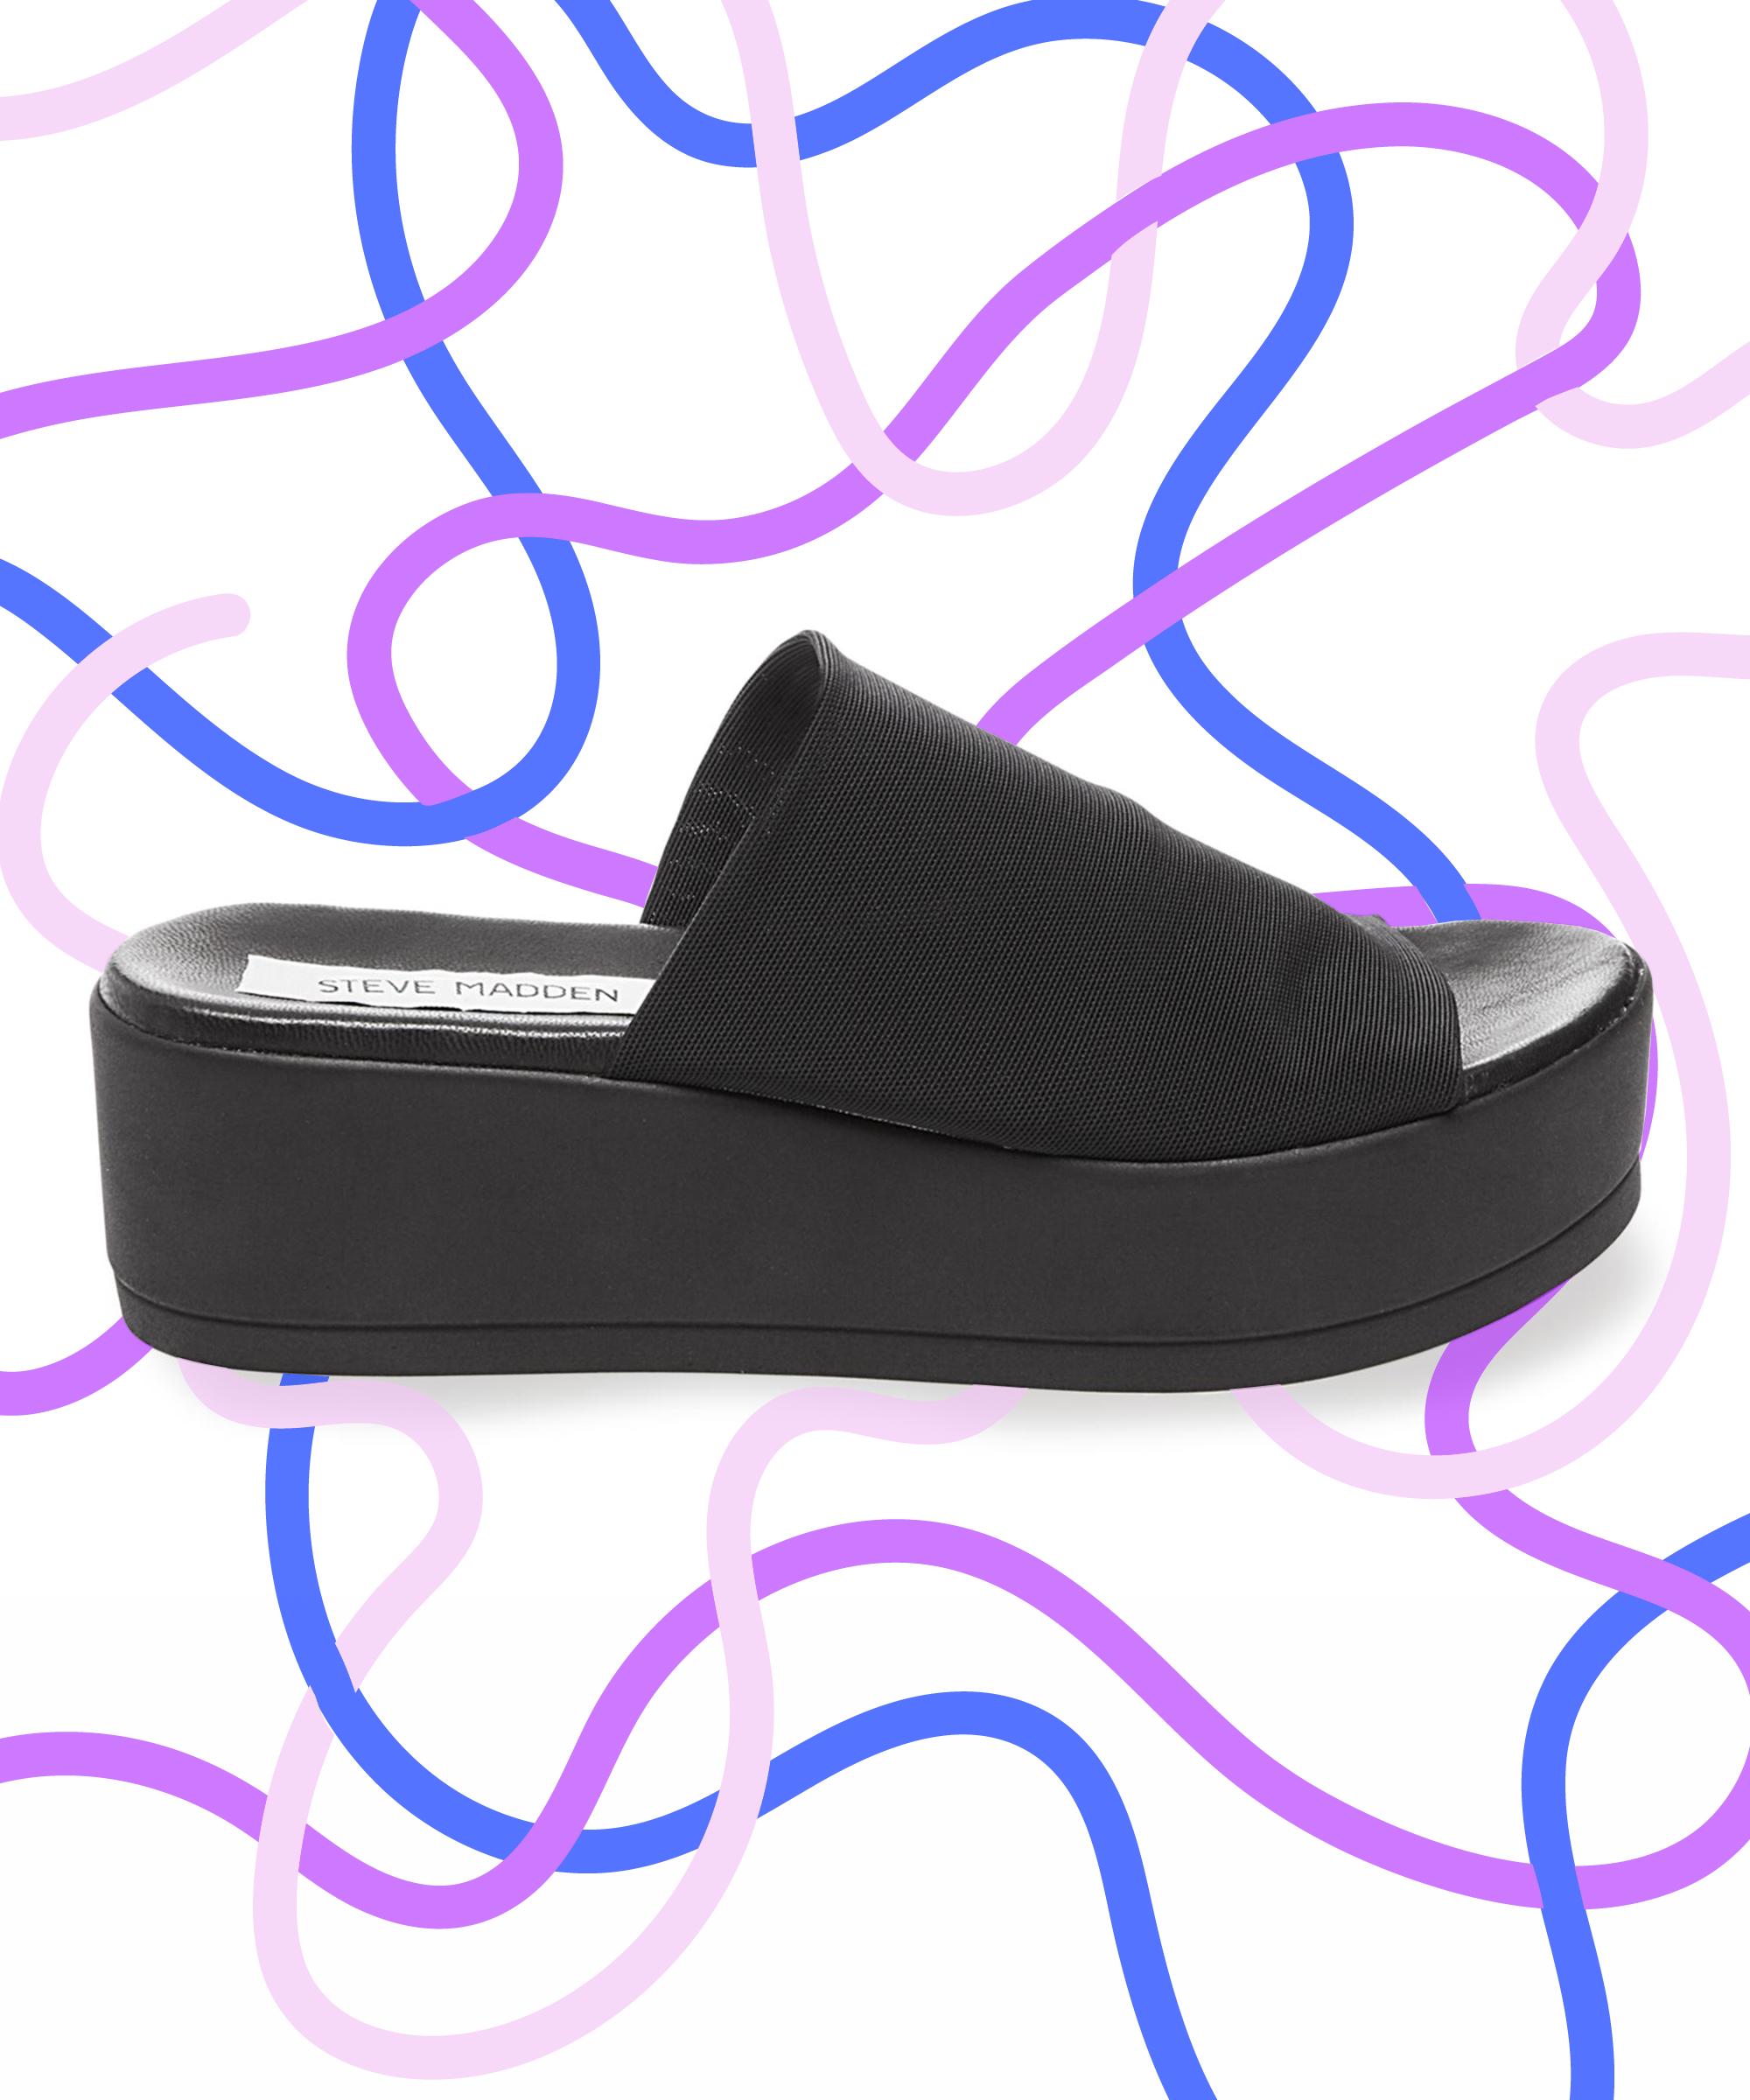 2fd819a94c3 Steve Madden 90s Platform Sandal Relaunch Chunky Heel